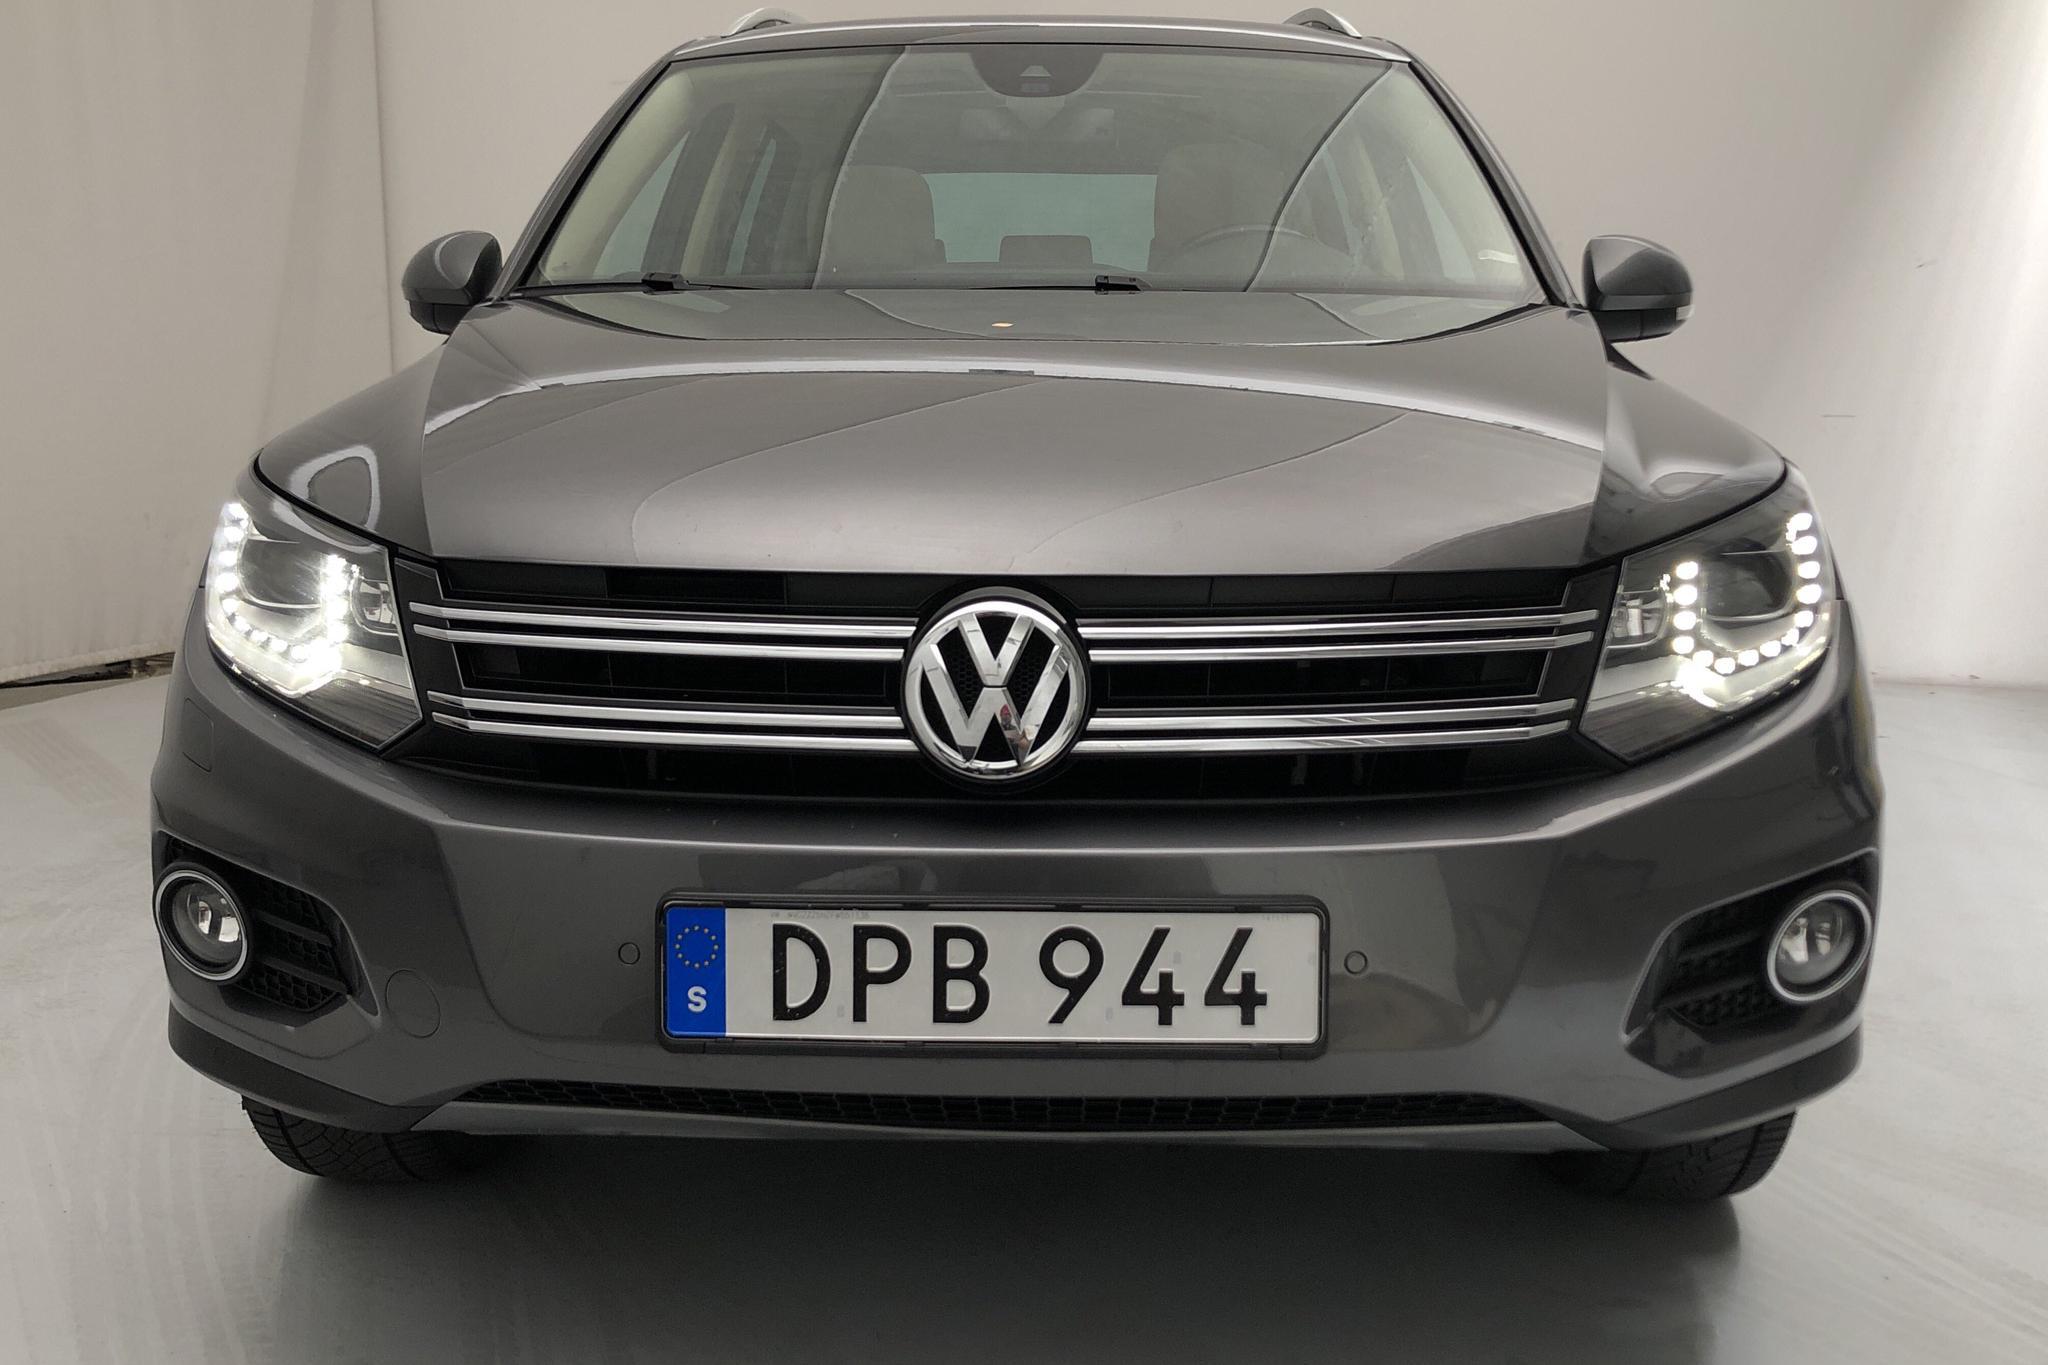 VW Tiguan 2.0 TDI 4MOTION BlueMotion Technology (177hk) - 107 740 km - Automatic - Dark Grey - 2015